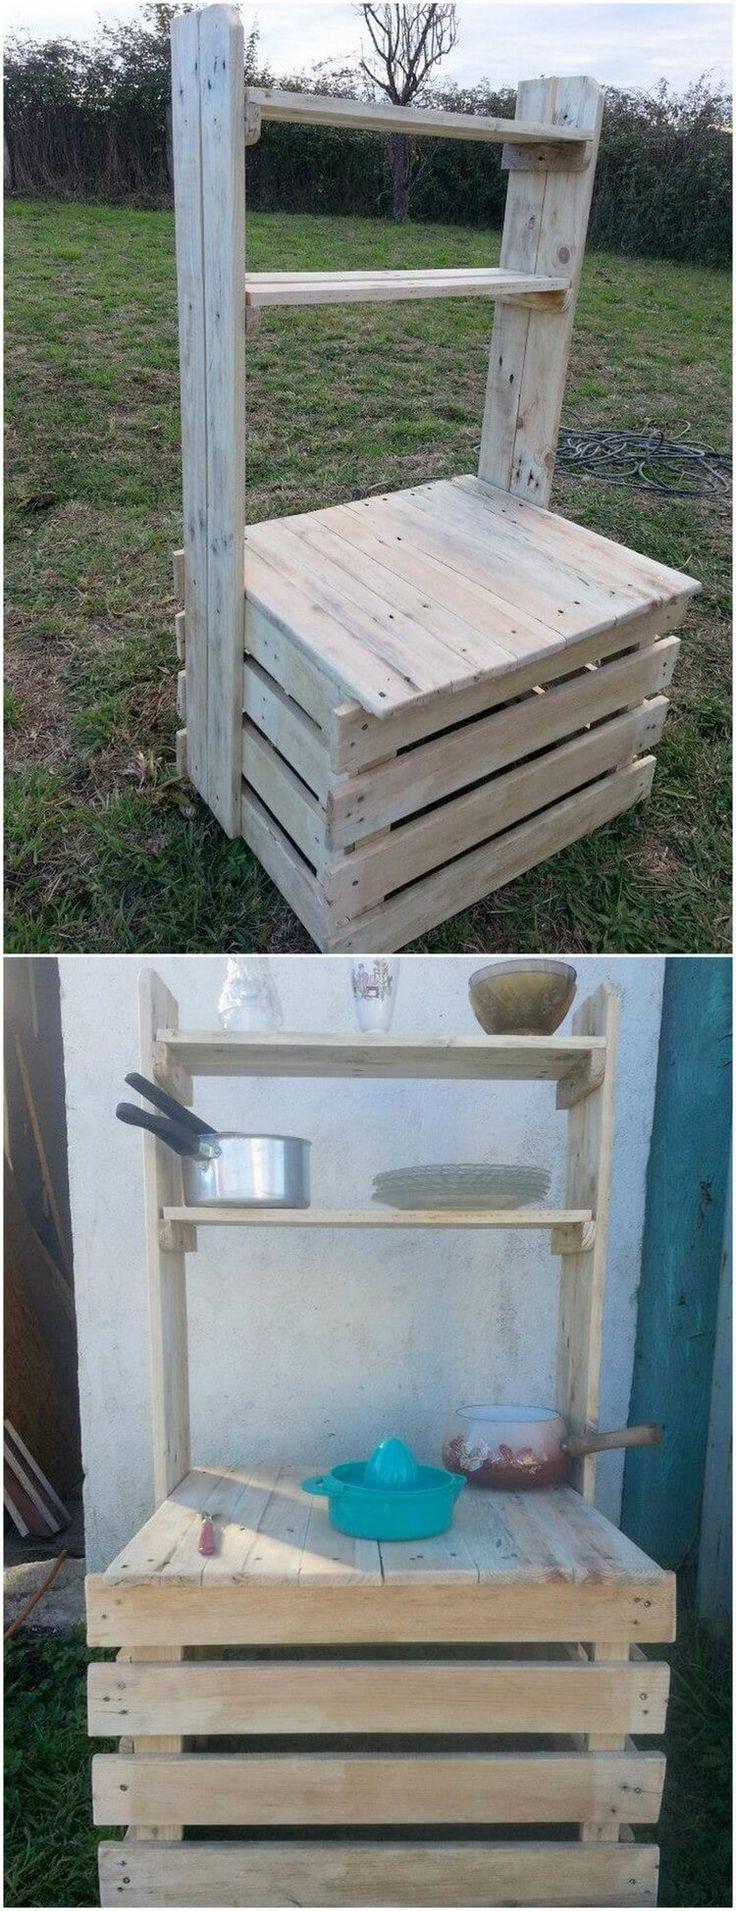 best 25 wooden pallet furniture ideas on pinterest pallet furniture palet garden furniture. Black Bedroom Furniture Sets. Home Design Ideas